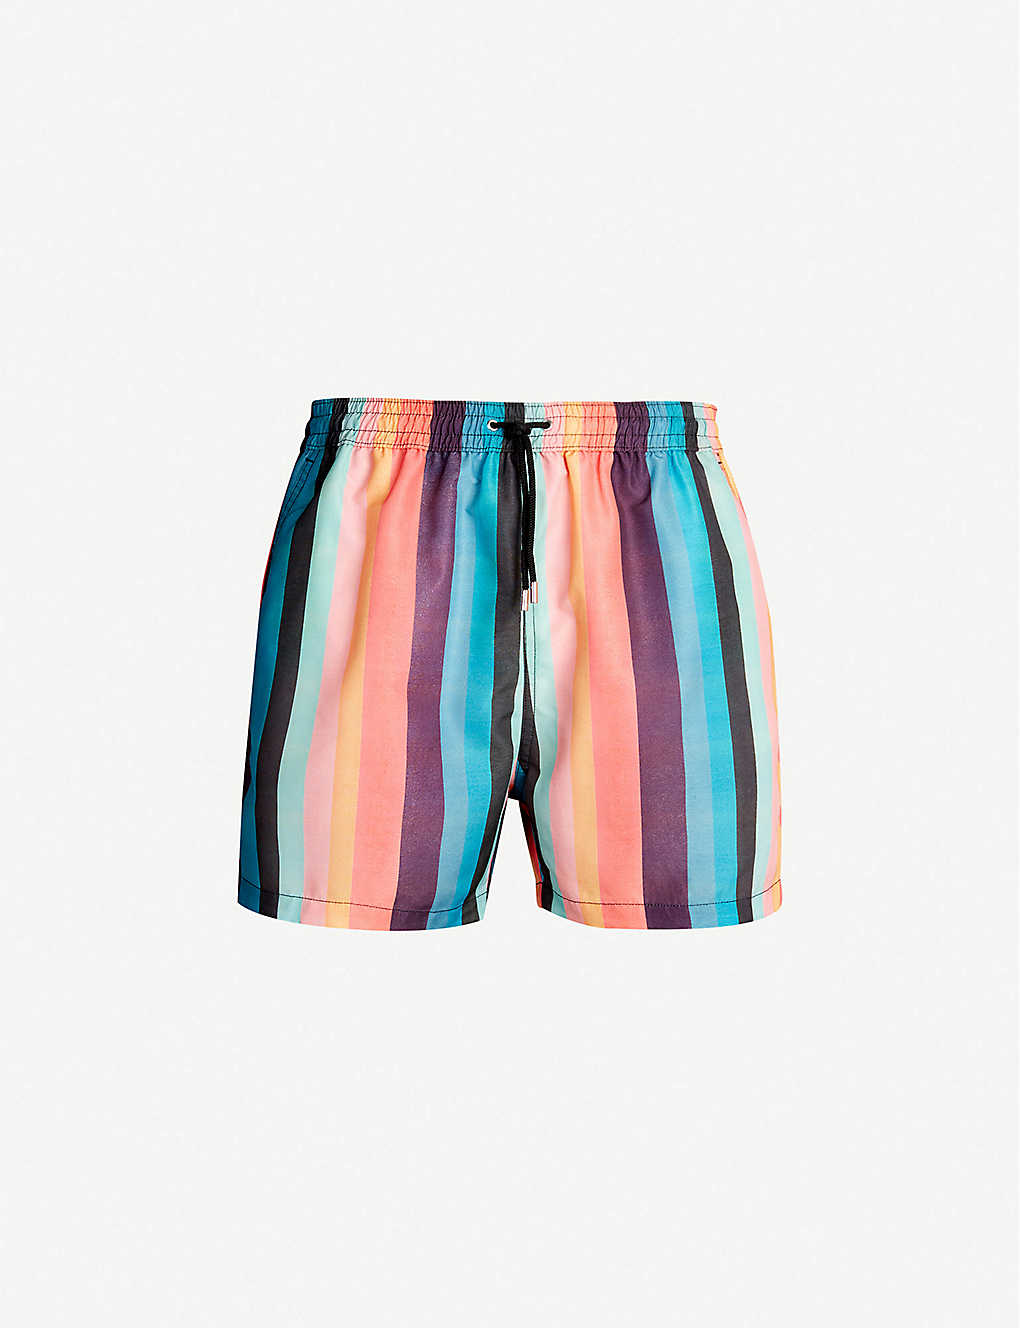 88d3644d18 PAUL SMITH - Striped relaxed-fit swim shorts | Selfridges.com